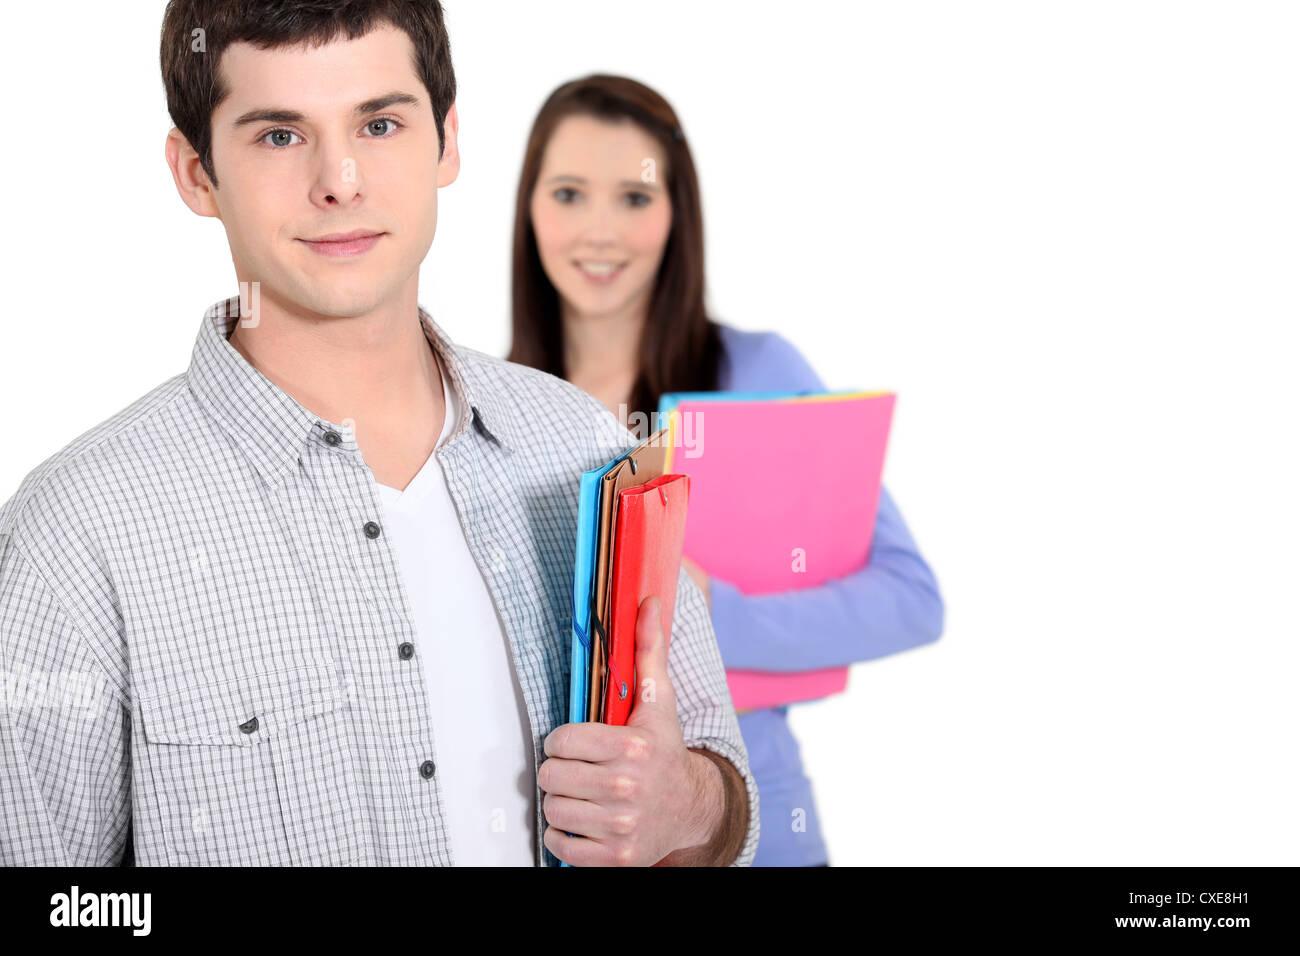 Teens with folders - Stock Image